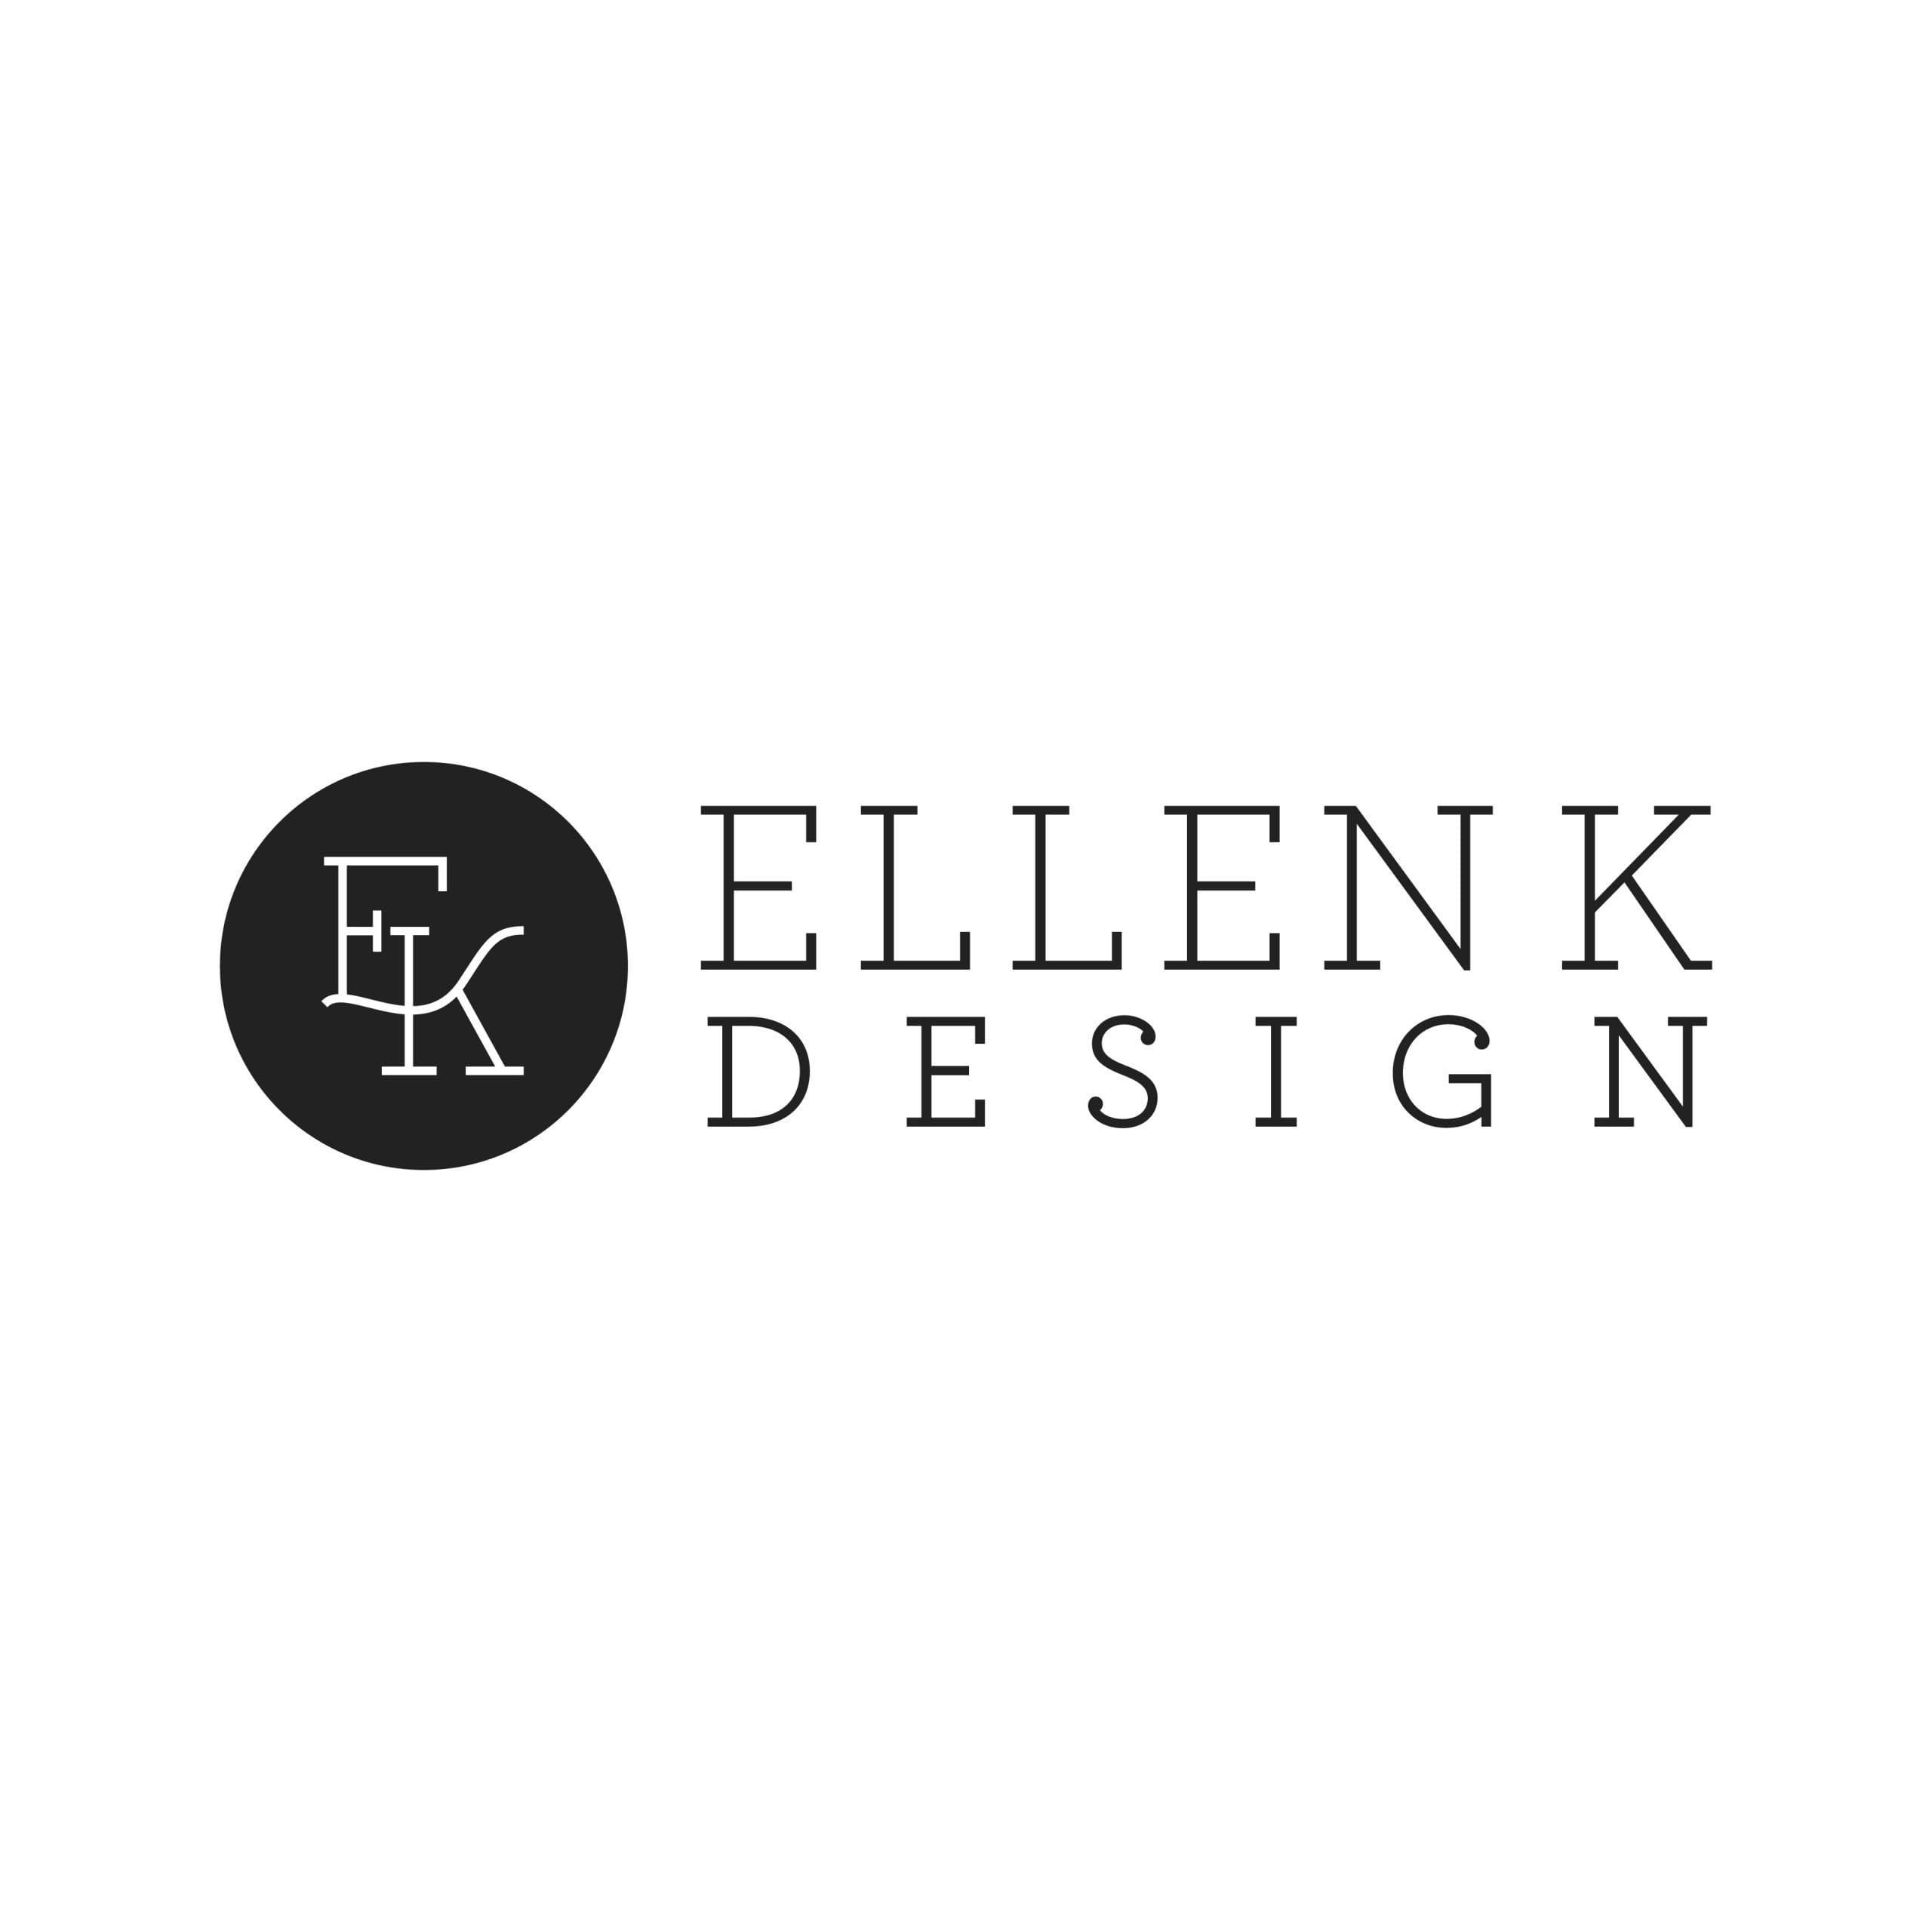 Ellen K. Design Logo Design